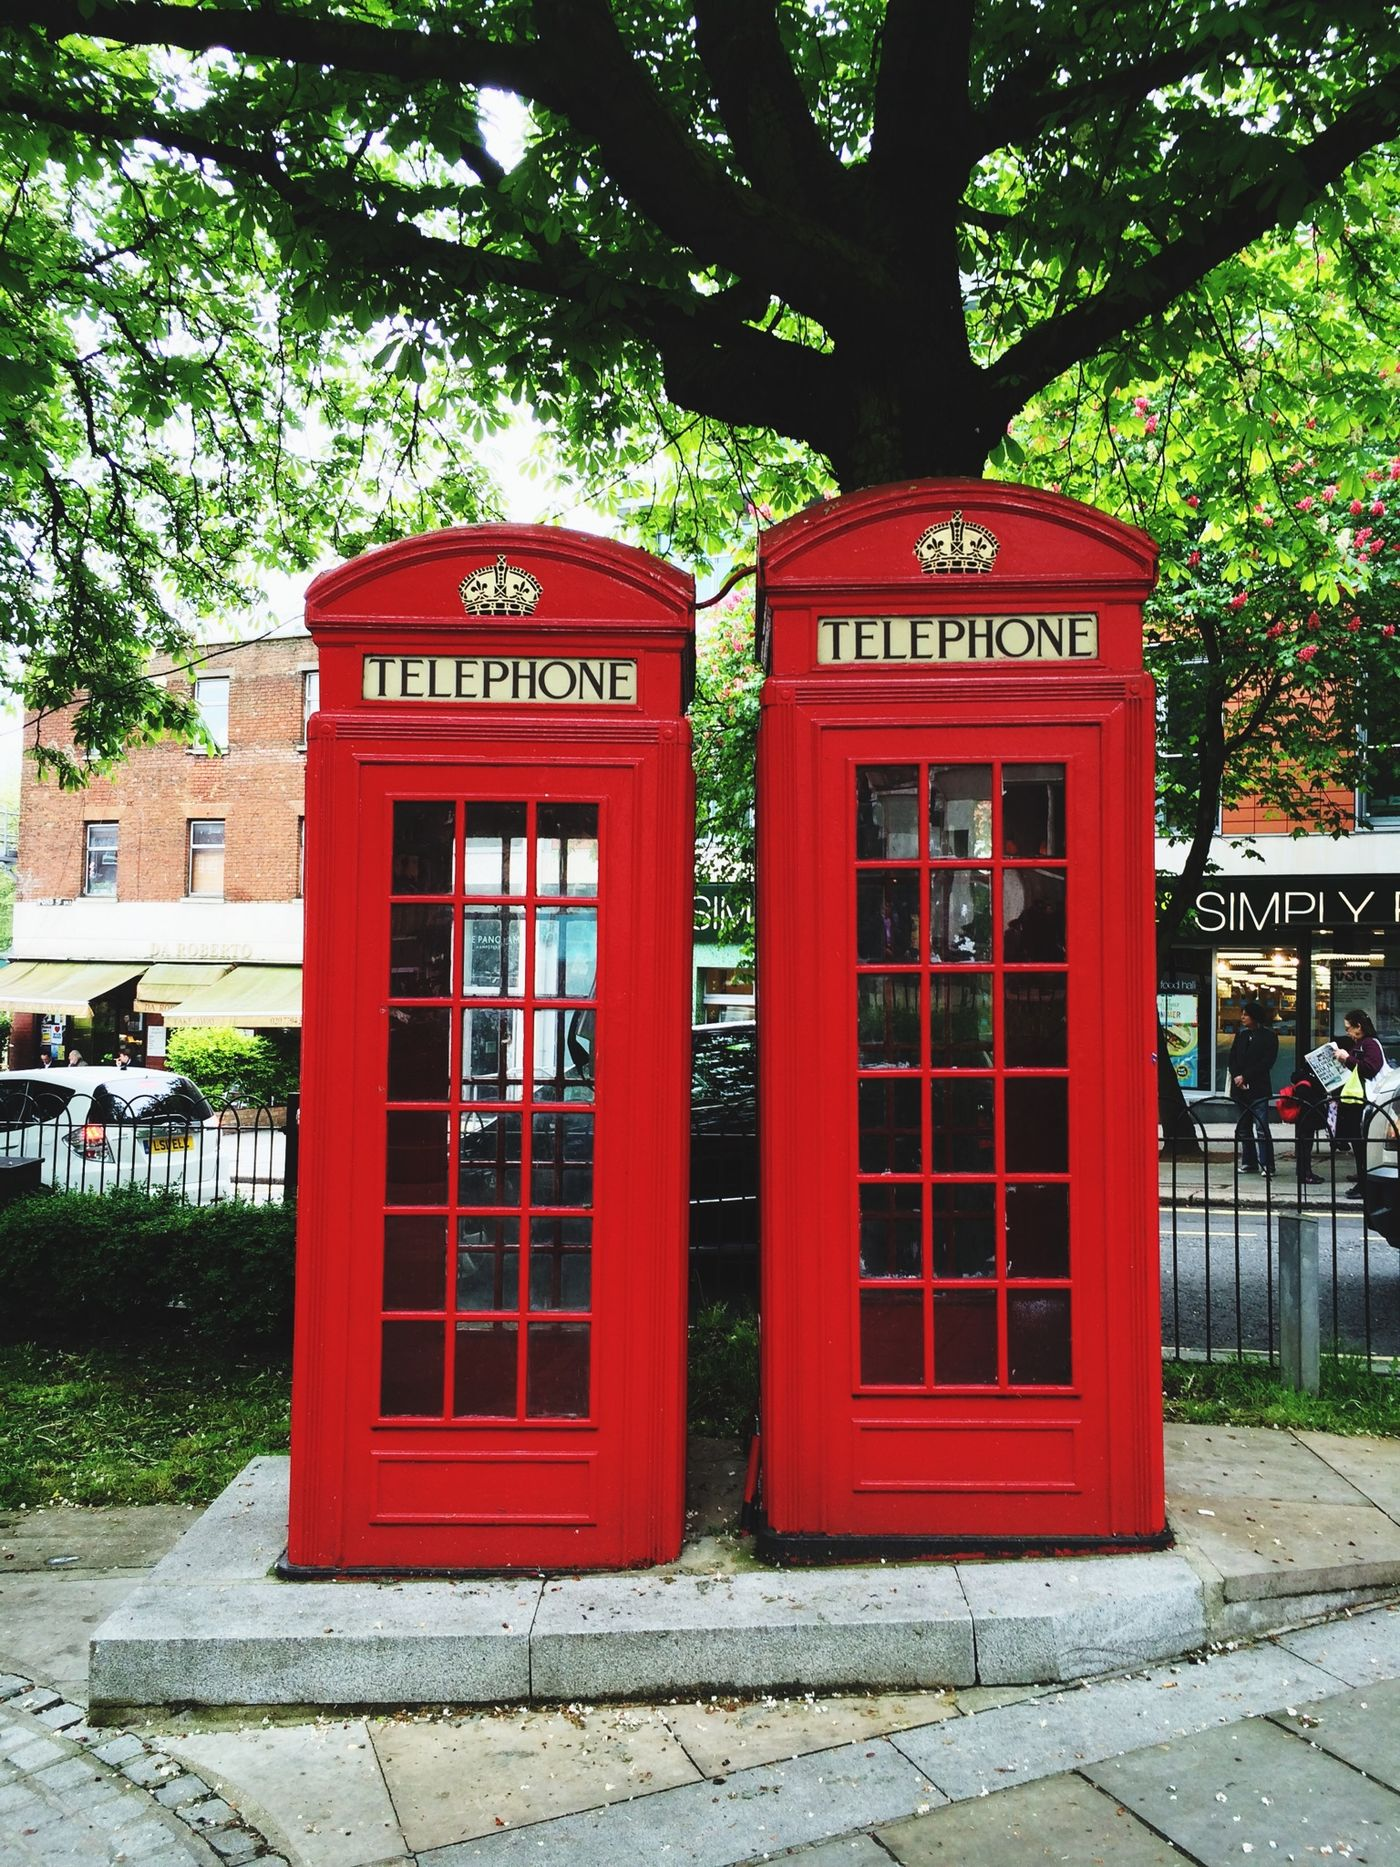 London Red 3. Taking Photos EyeEm Best Shots Streetphotography EyeEm Best Edits